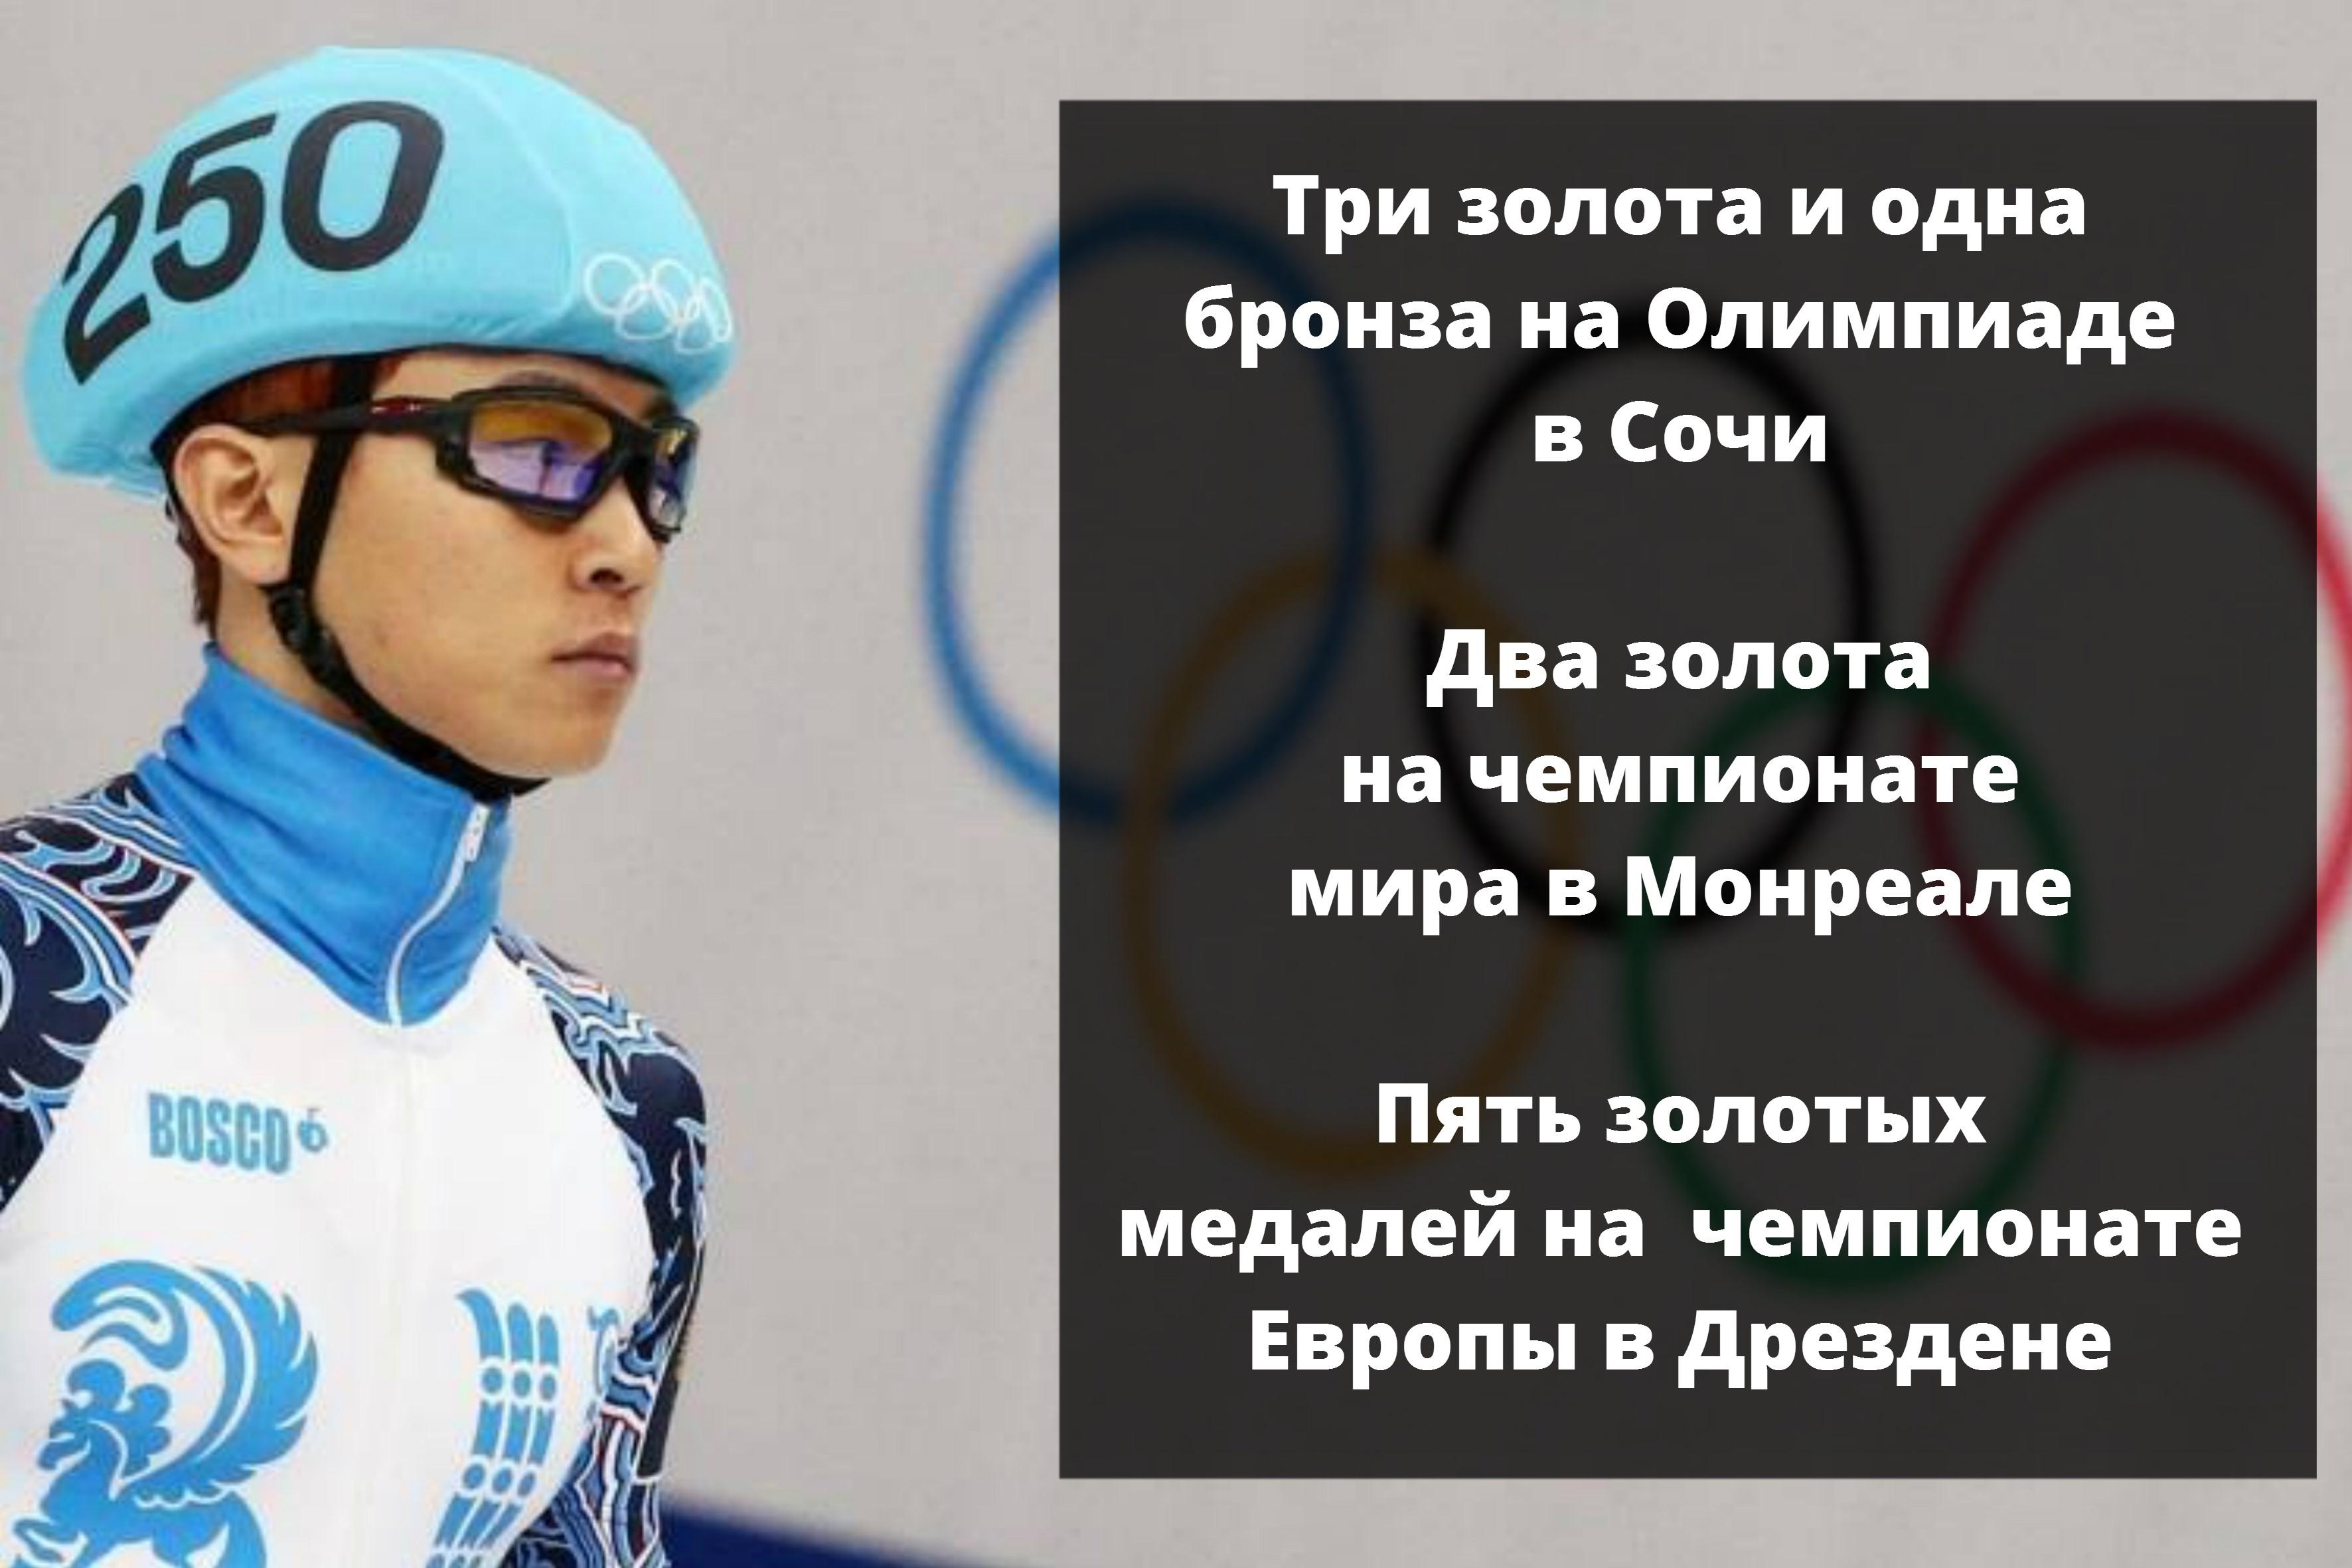 https://i.eurosport.com/2014/12/31/1380911.jpg